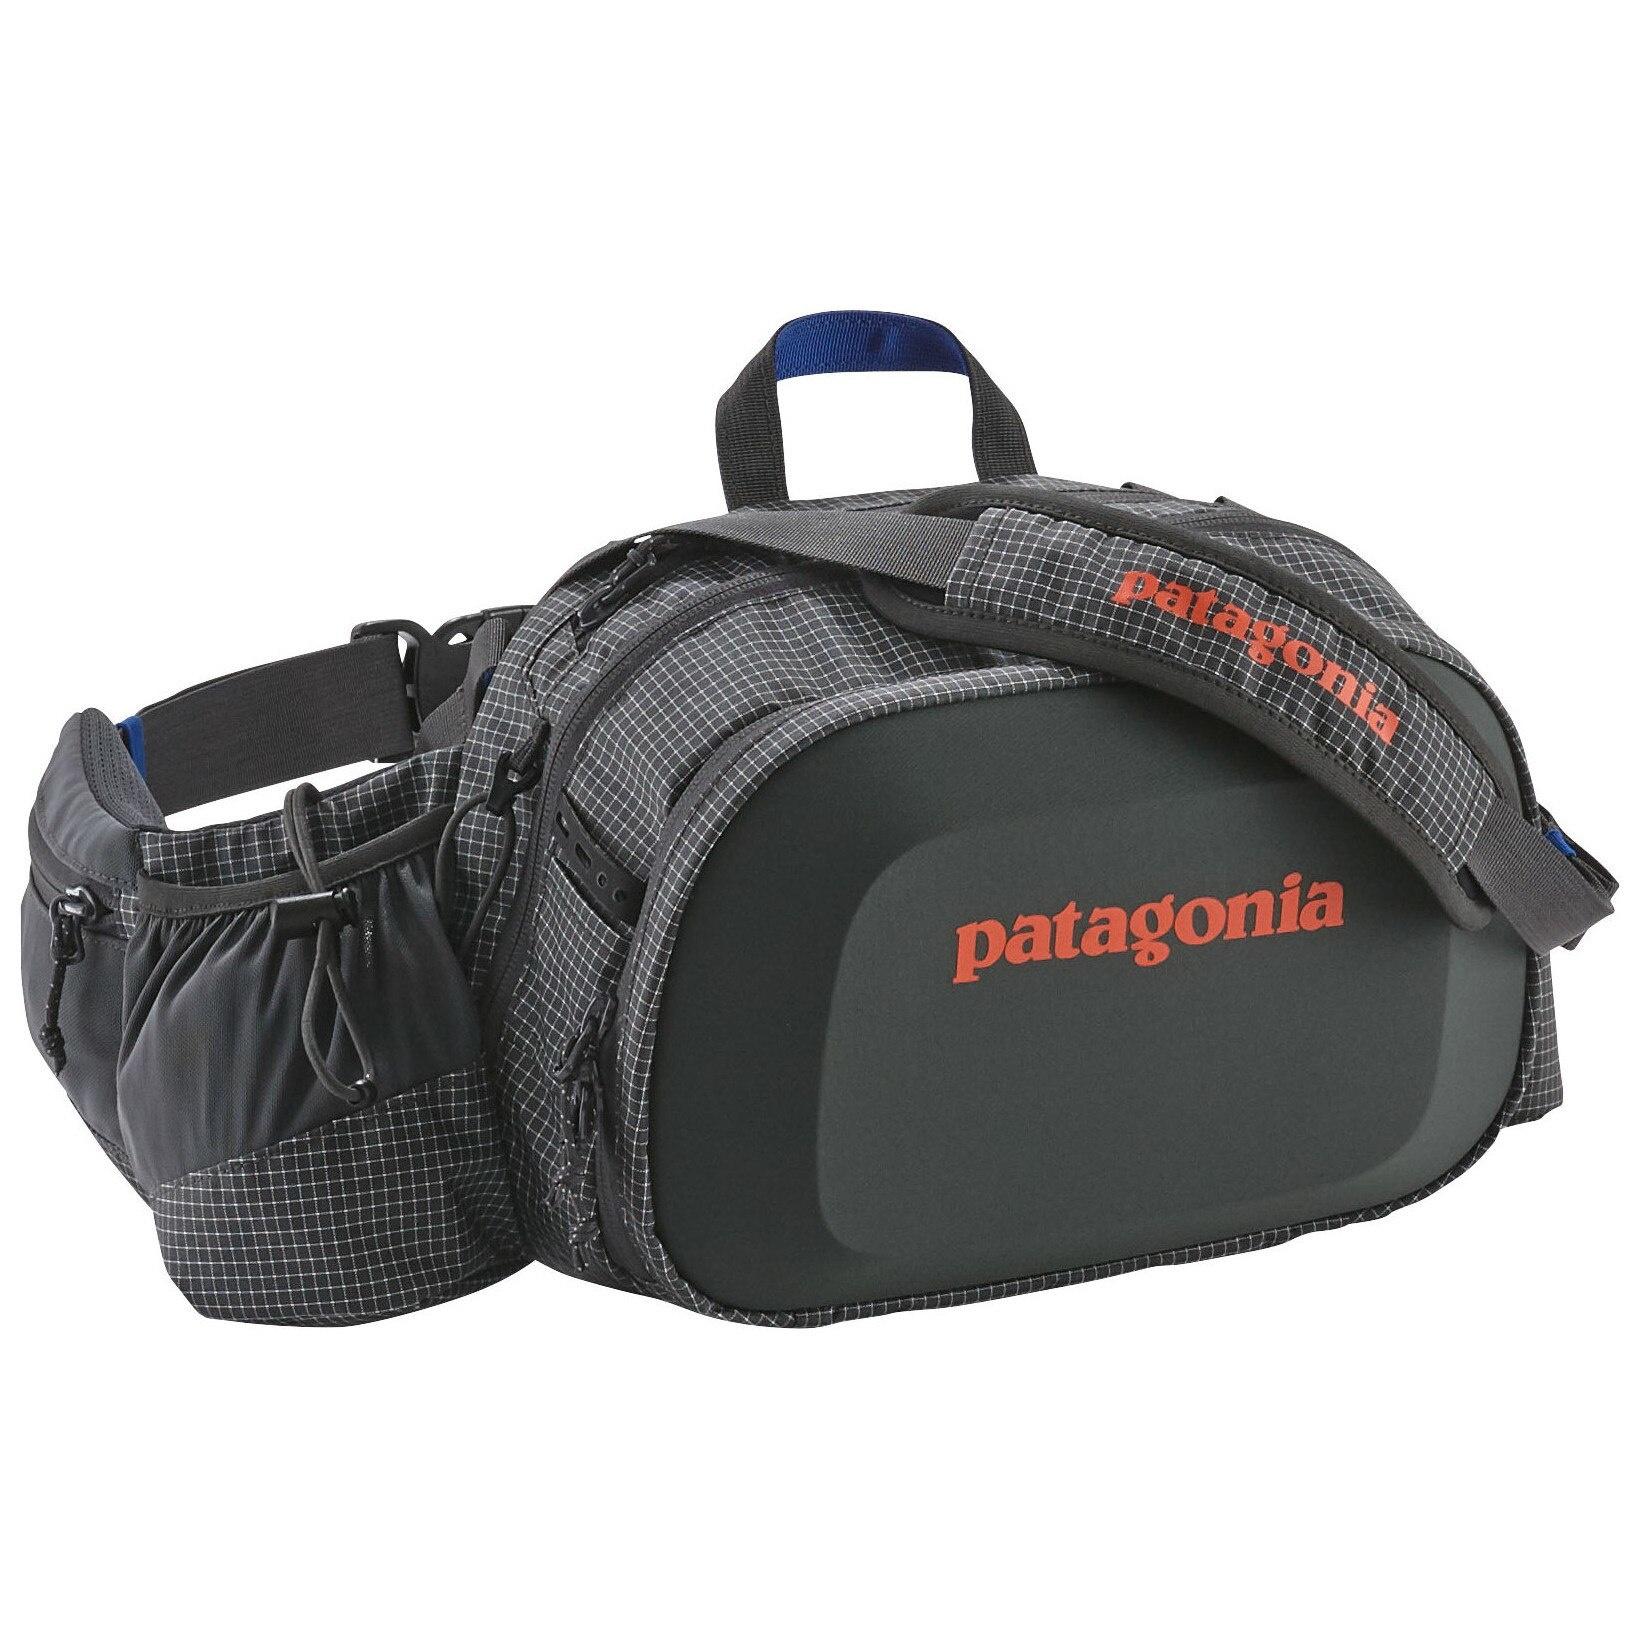 PATAGONIA Stealth hip pack forge grey